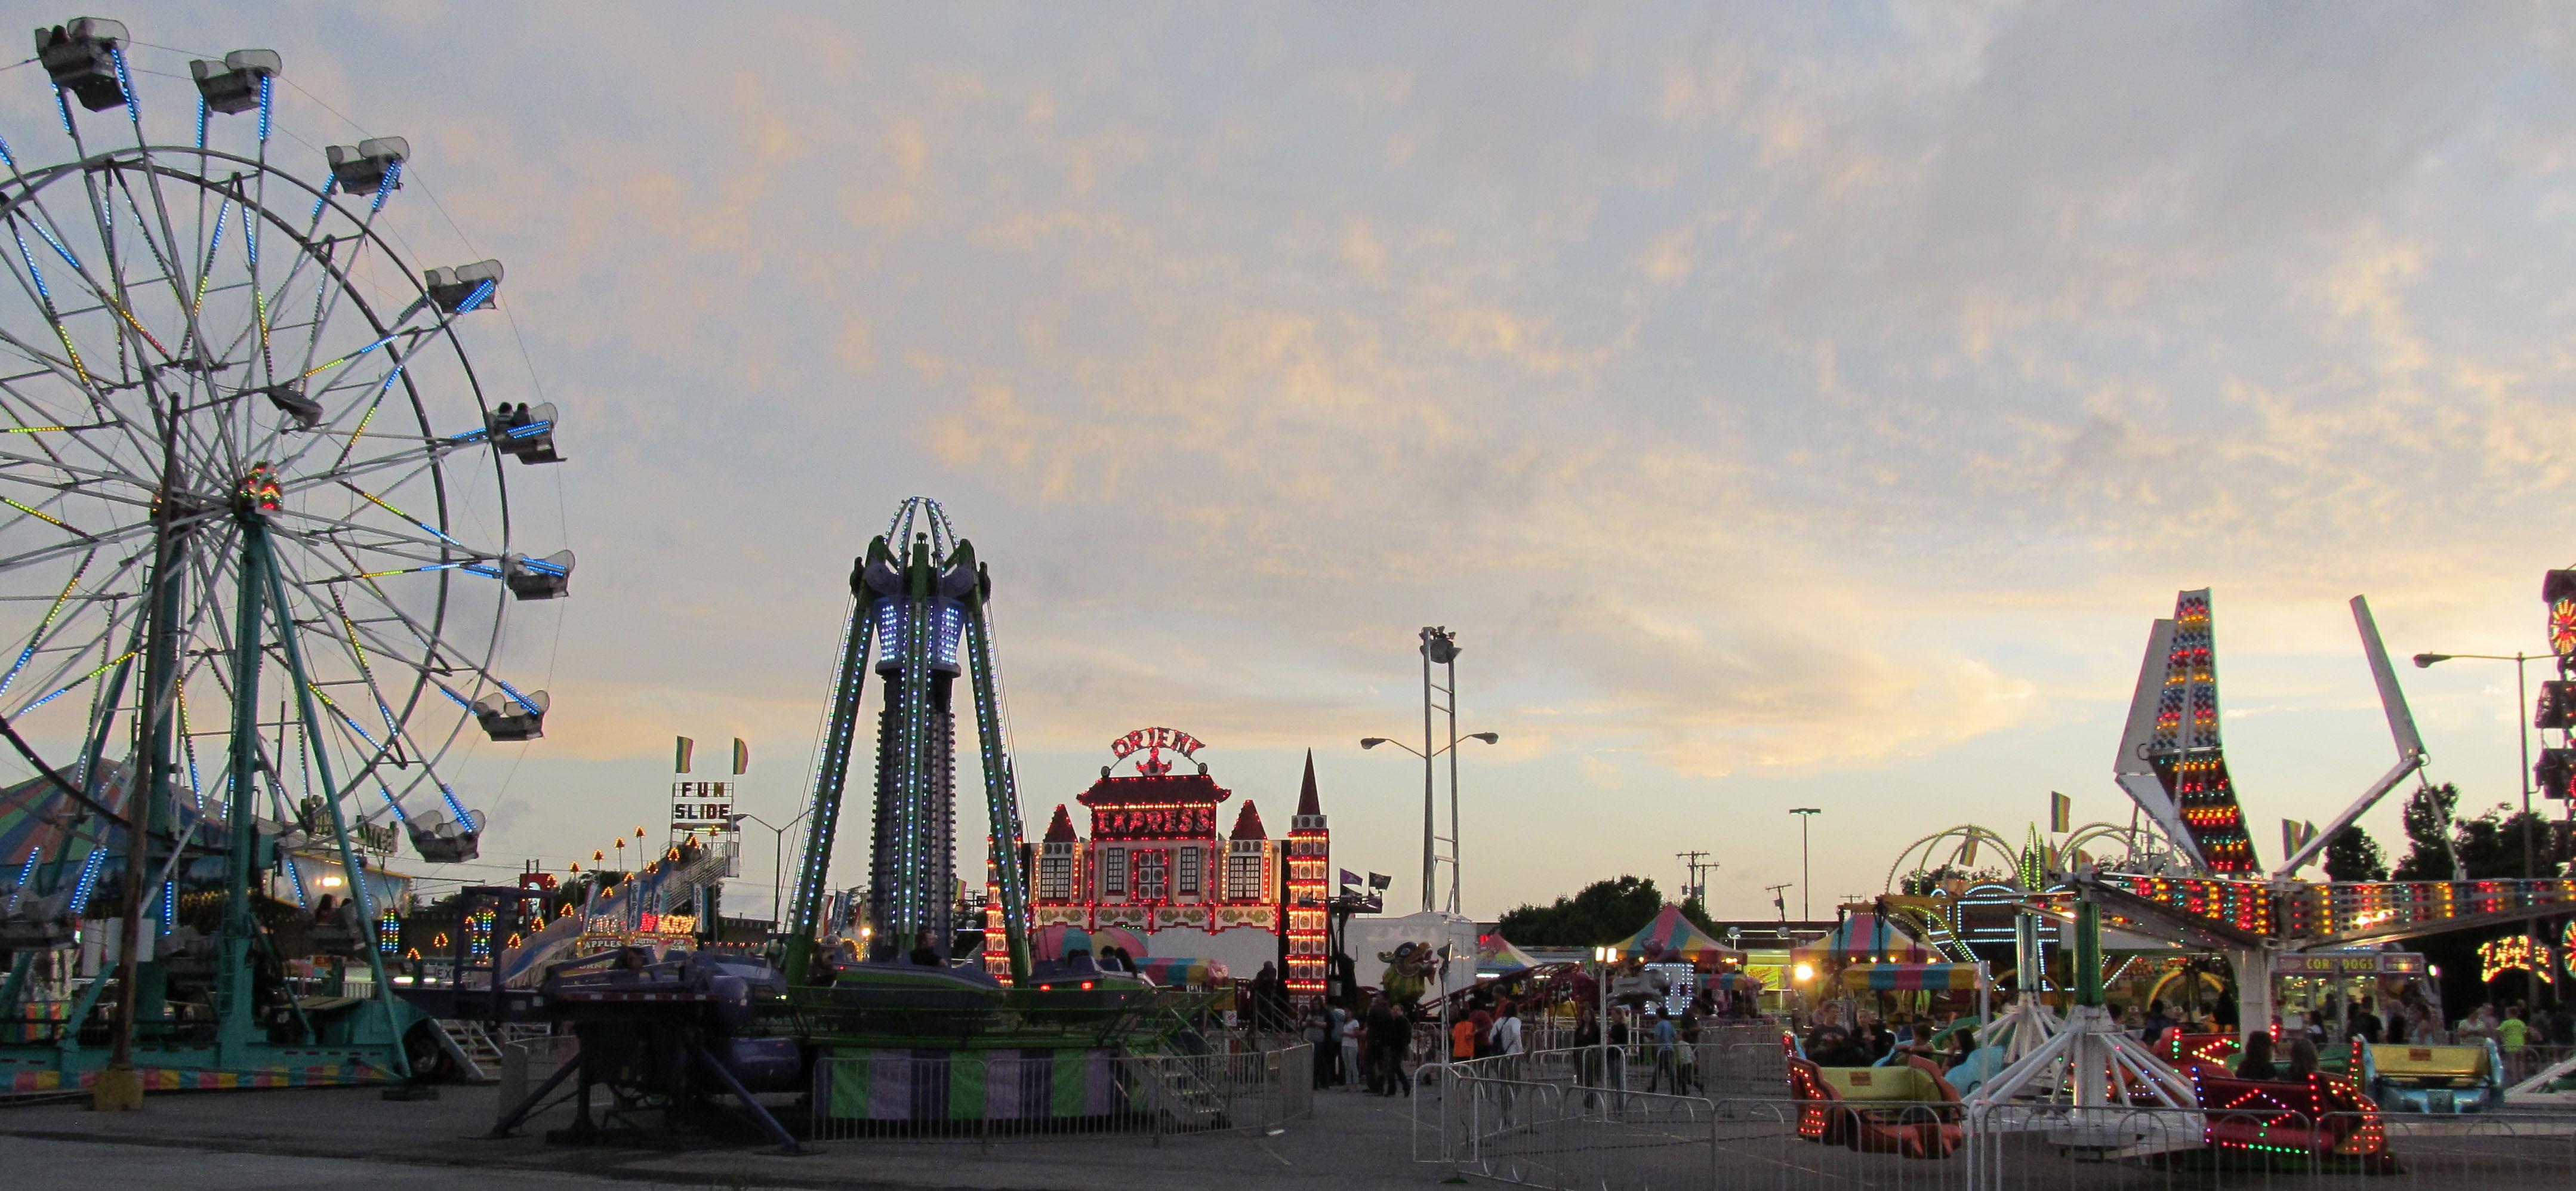 FB-carnival2.jpg